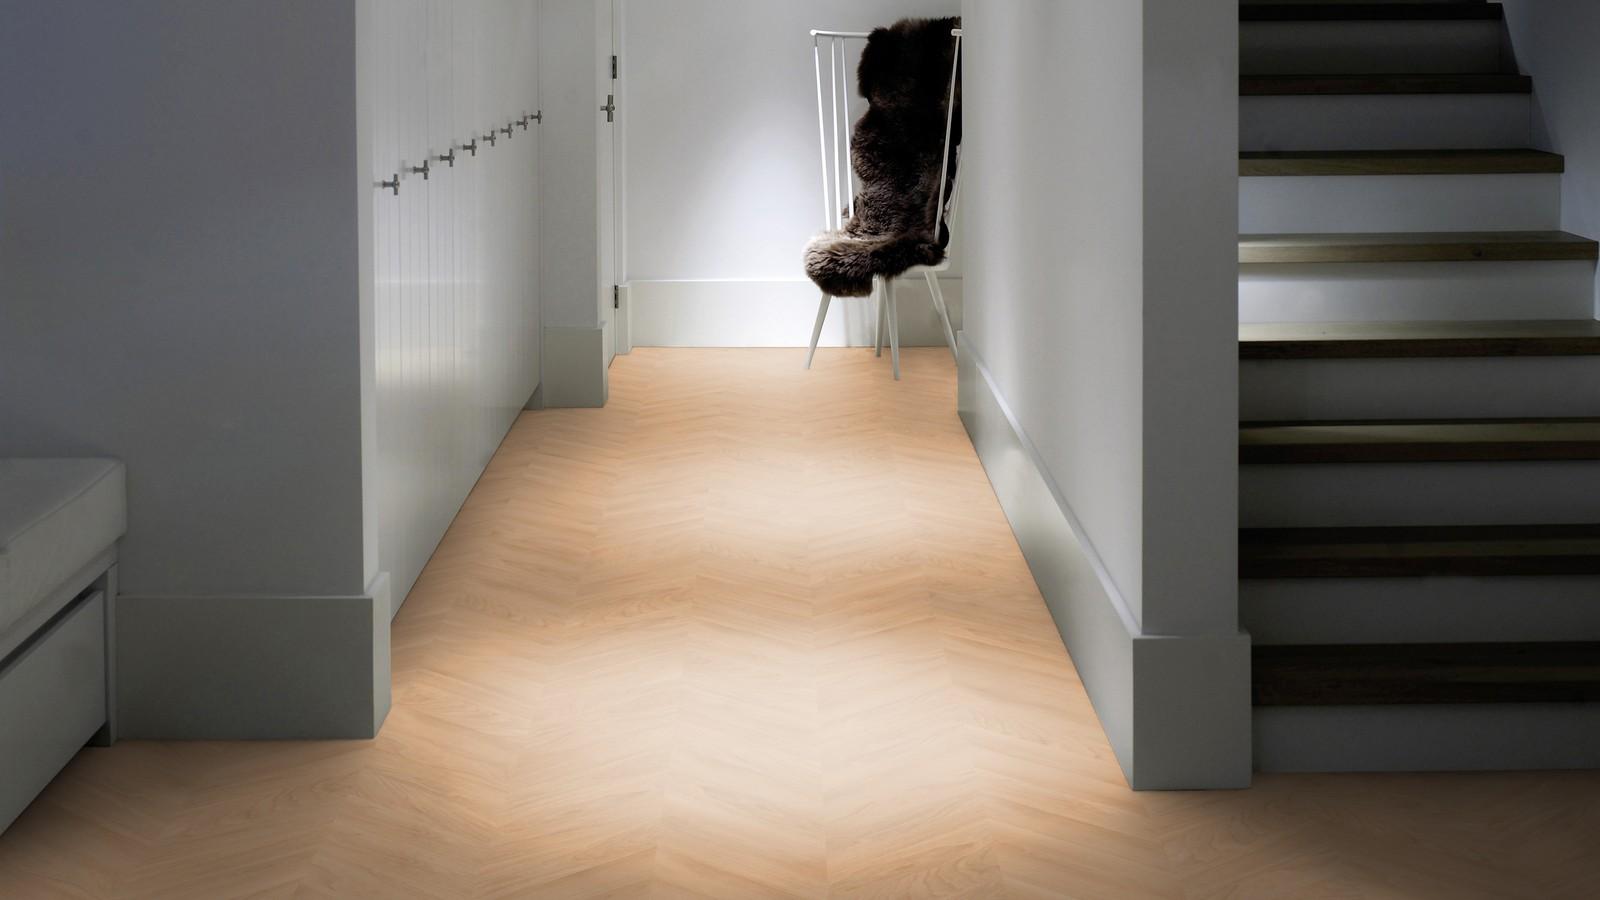 Piet boon parket vloeren shell chevron hongaarse punt patroon vloer